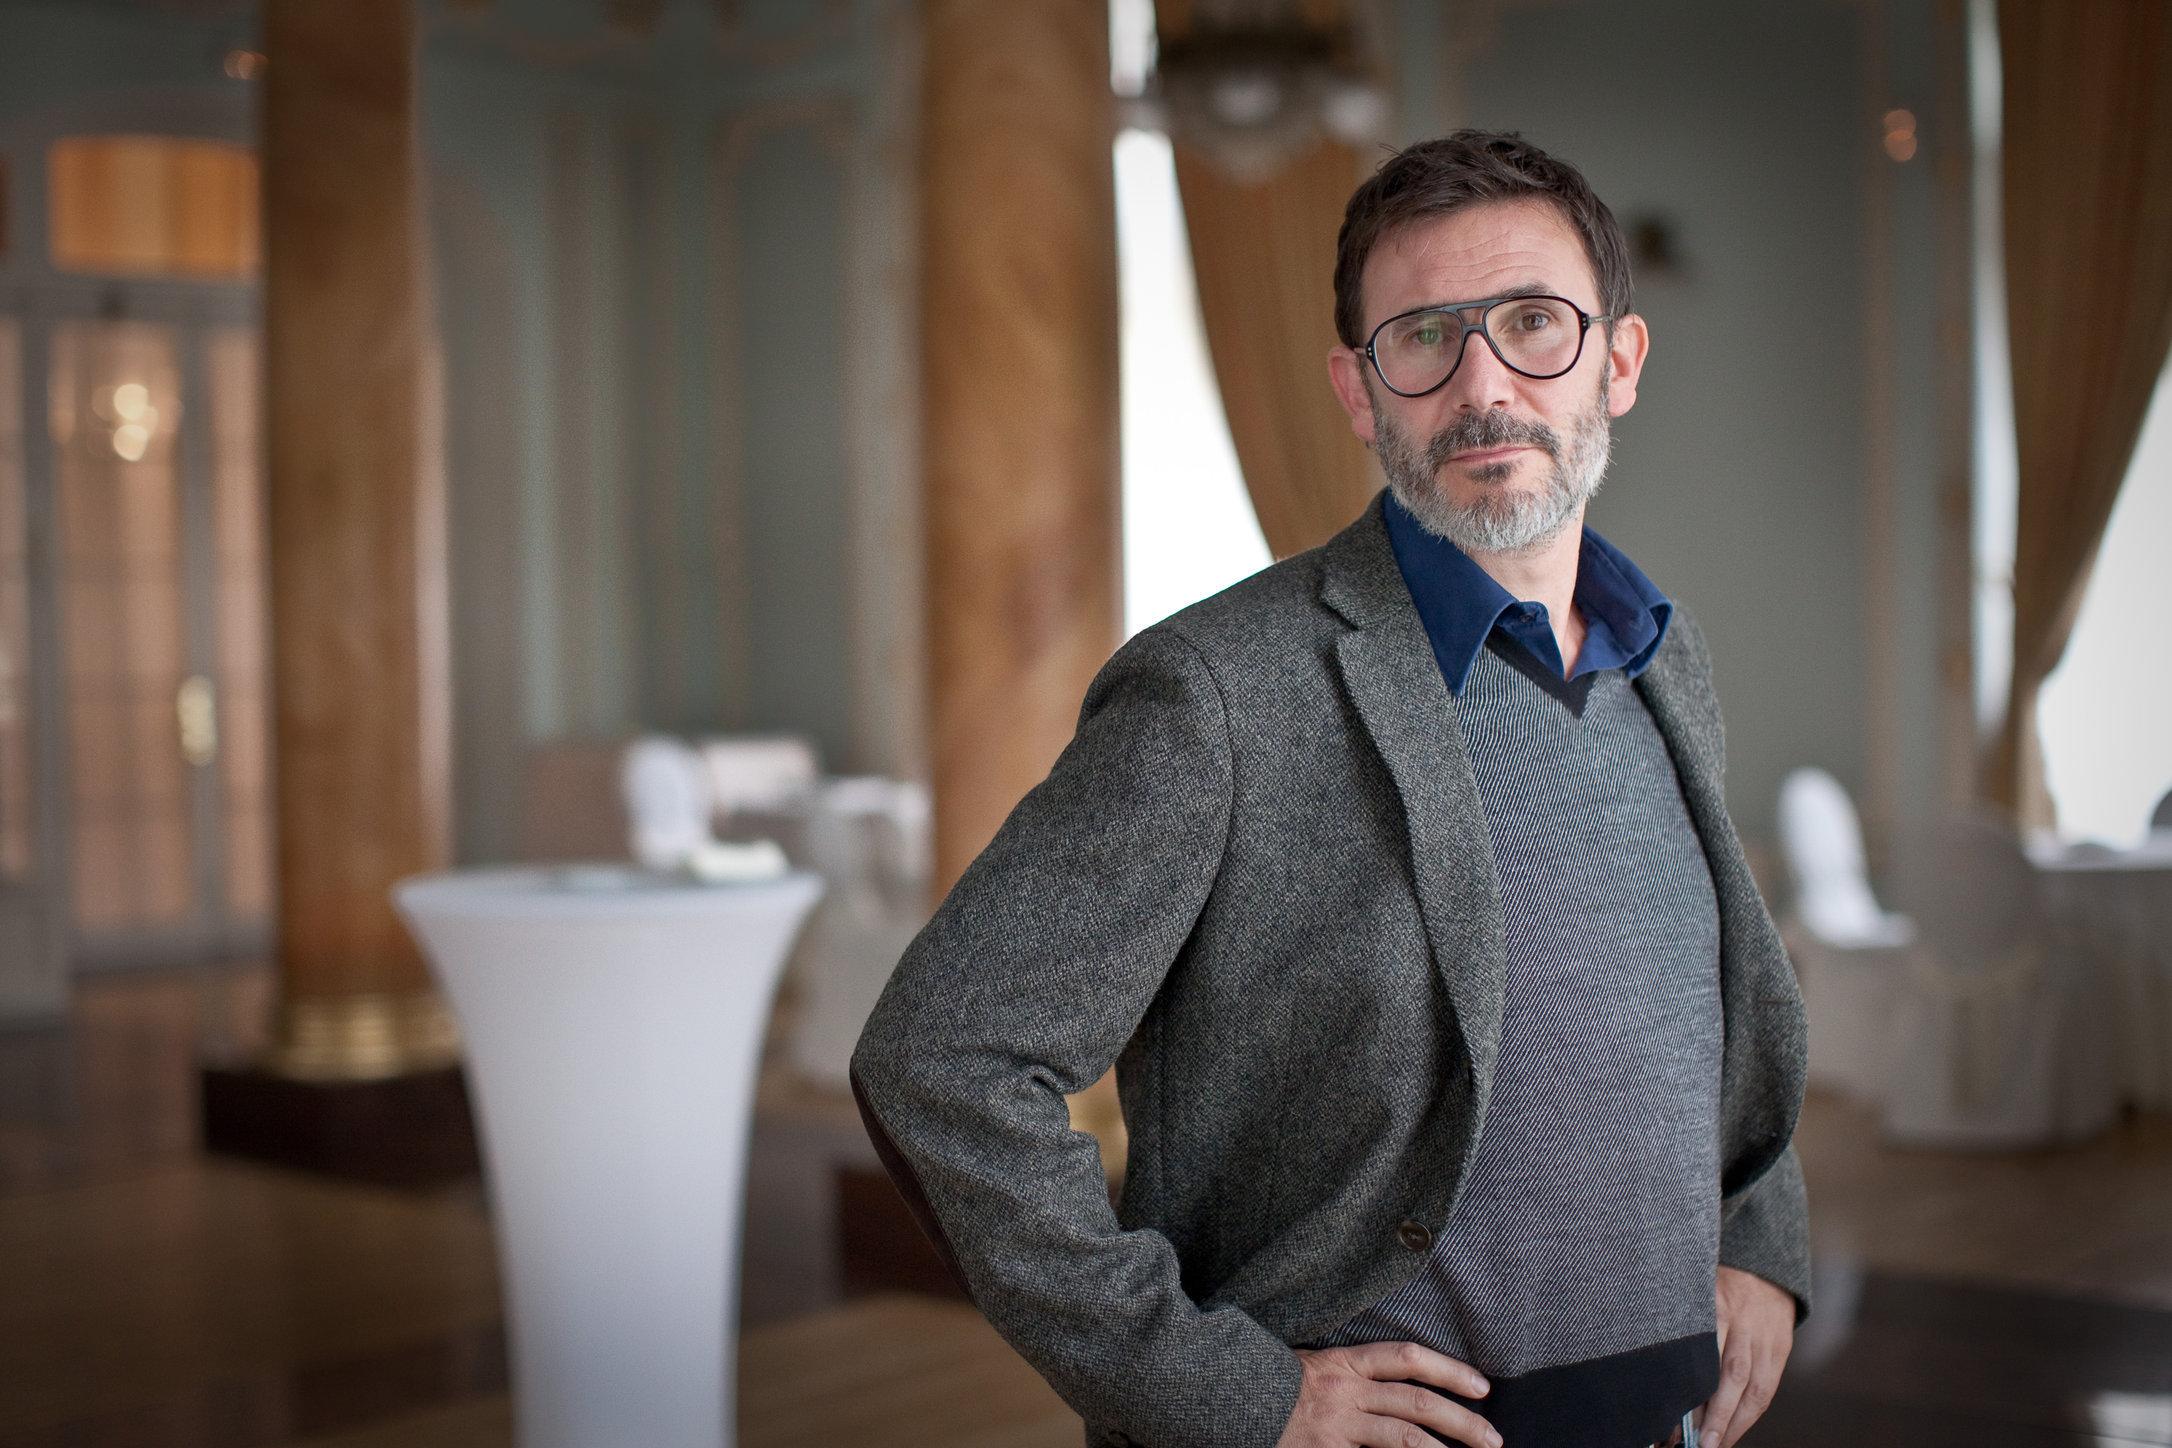 michel hazanavicius, director